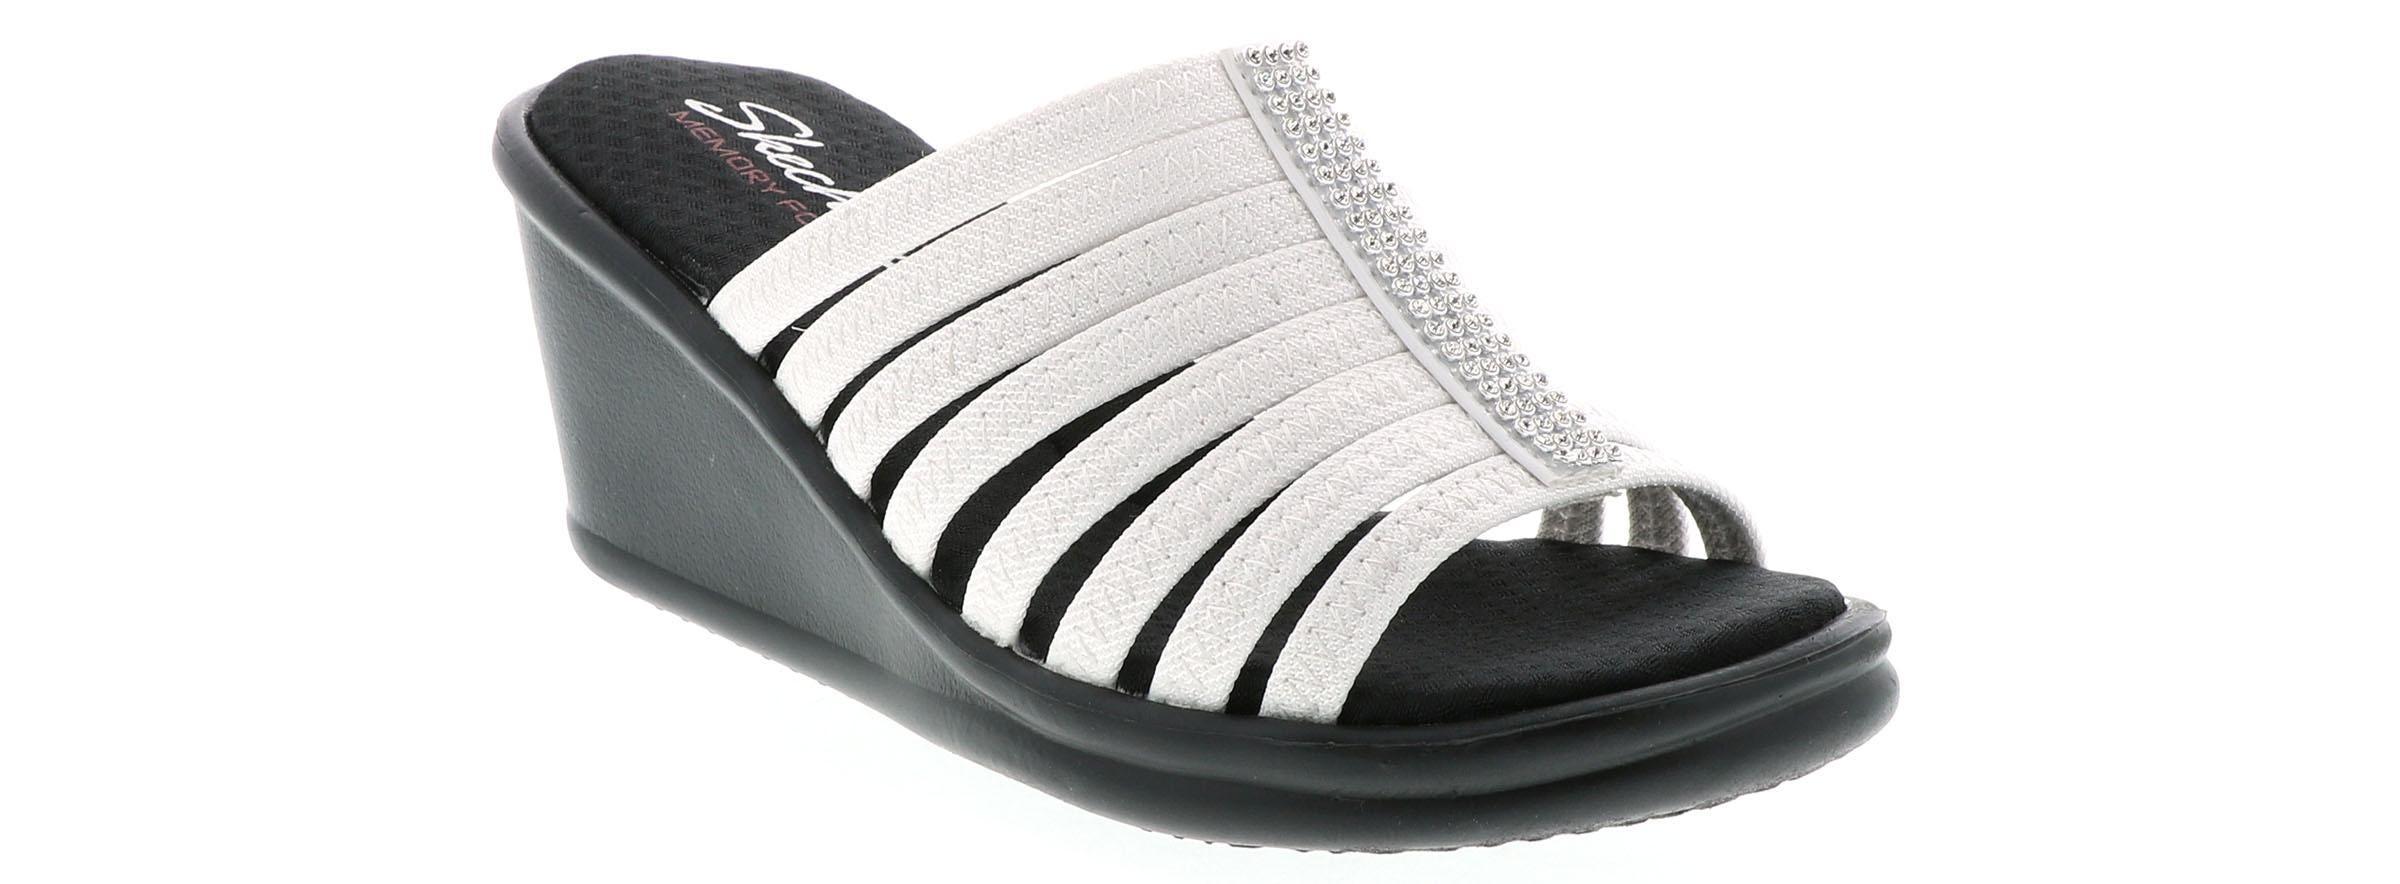 durable in use biggest discount brand new Women's Skechers Rumblers Hot Shot